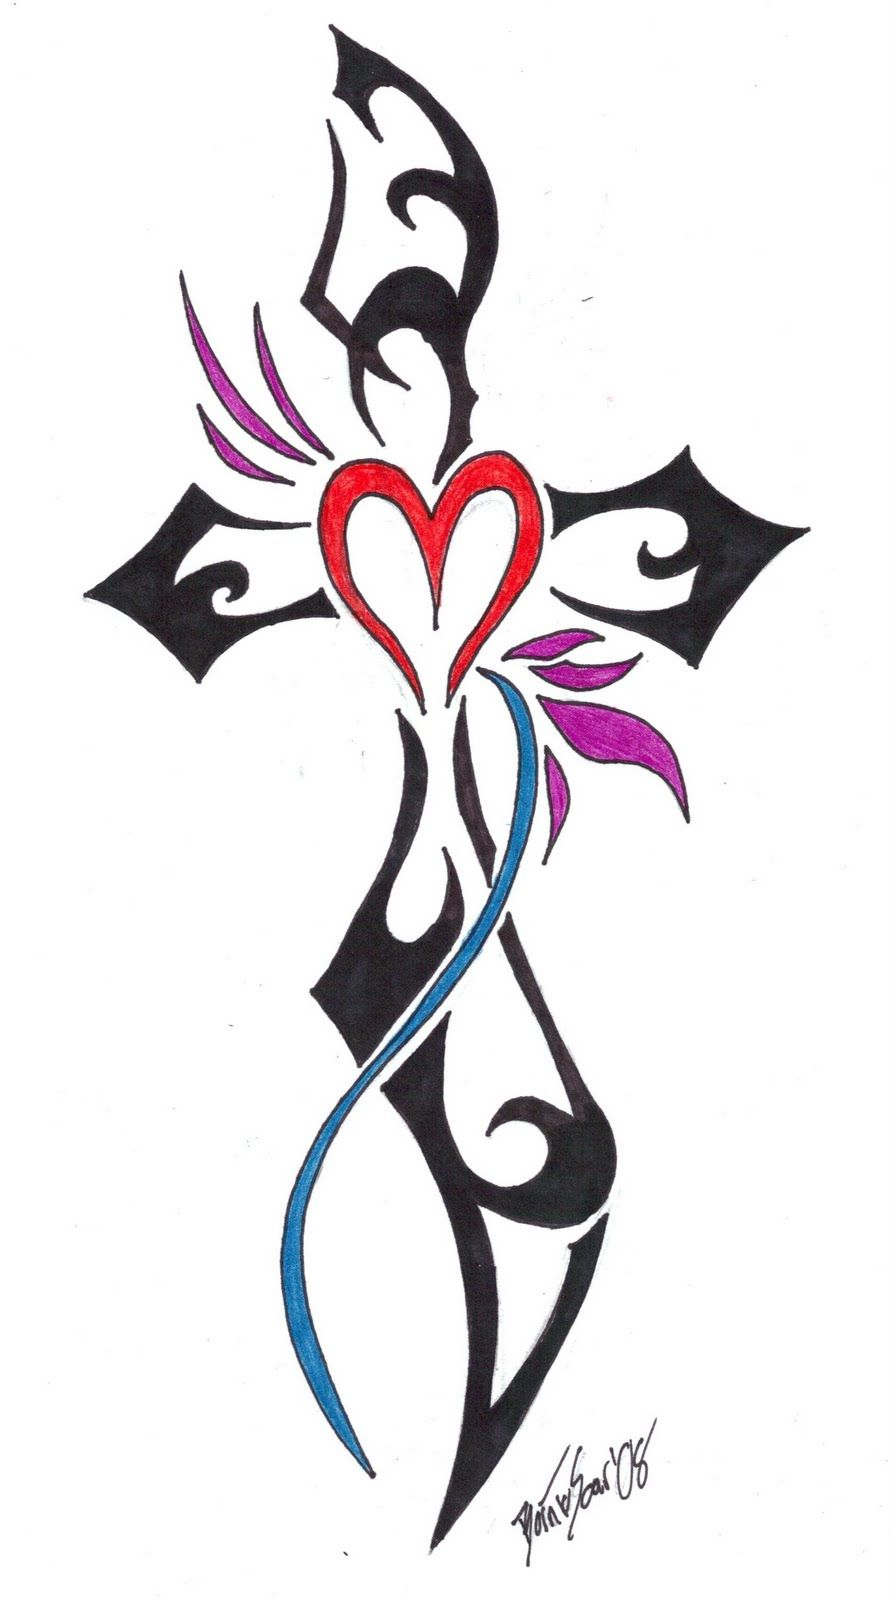 bd5d6963e Simple cross tattoo designs bing images also tattoos pinterest rh